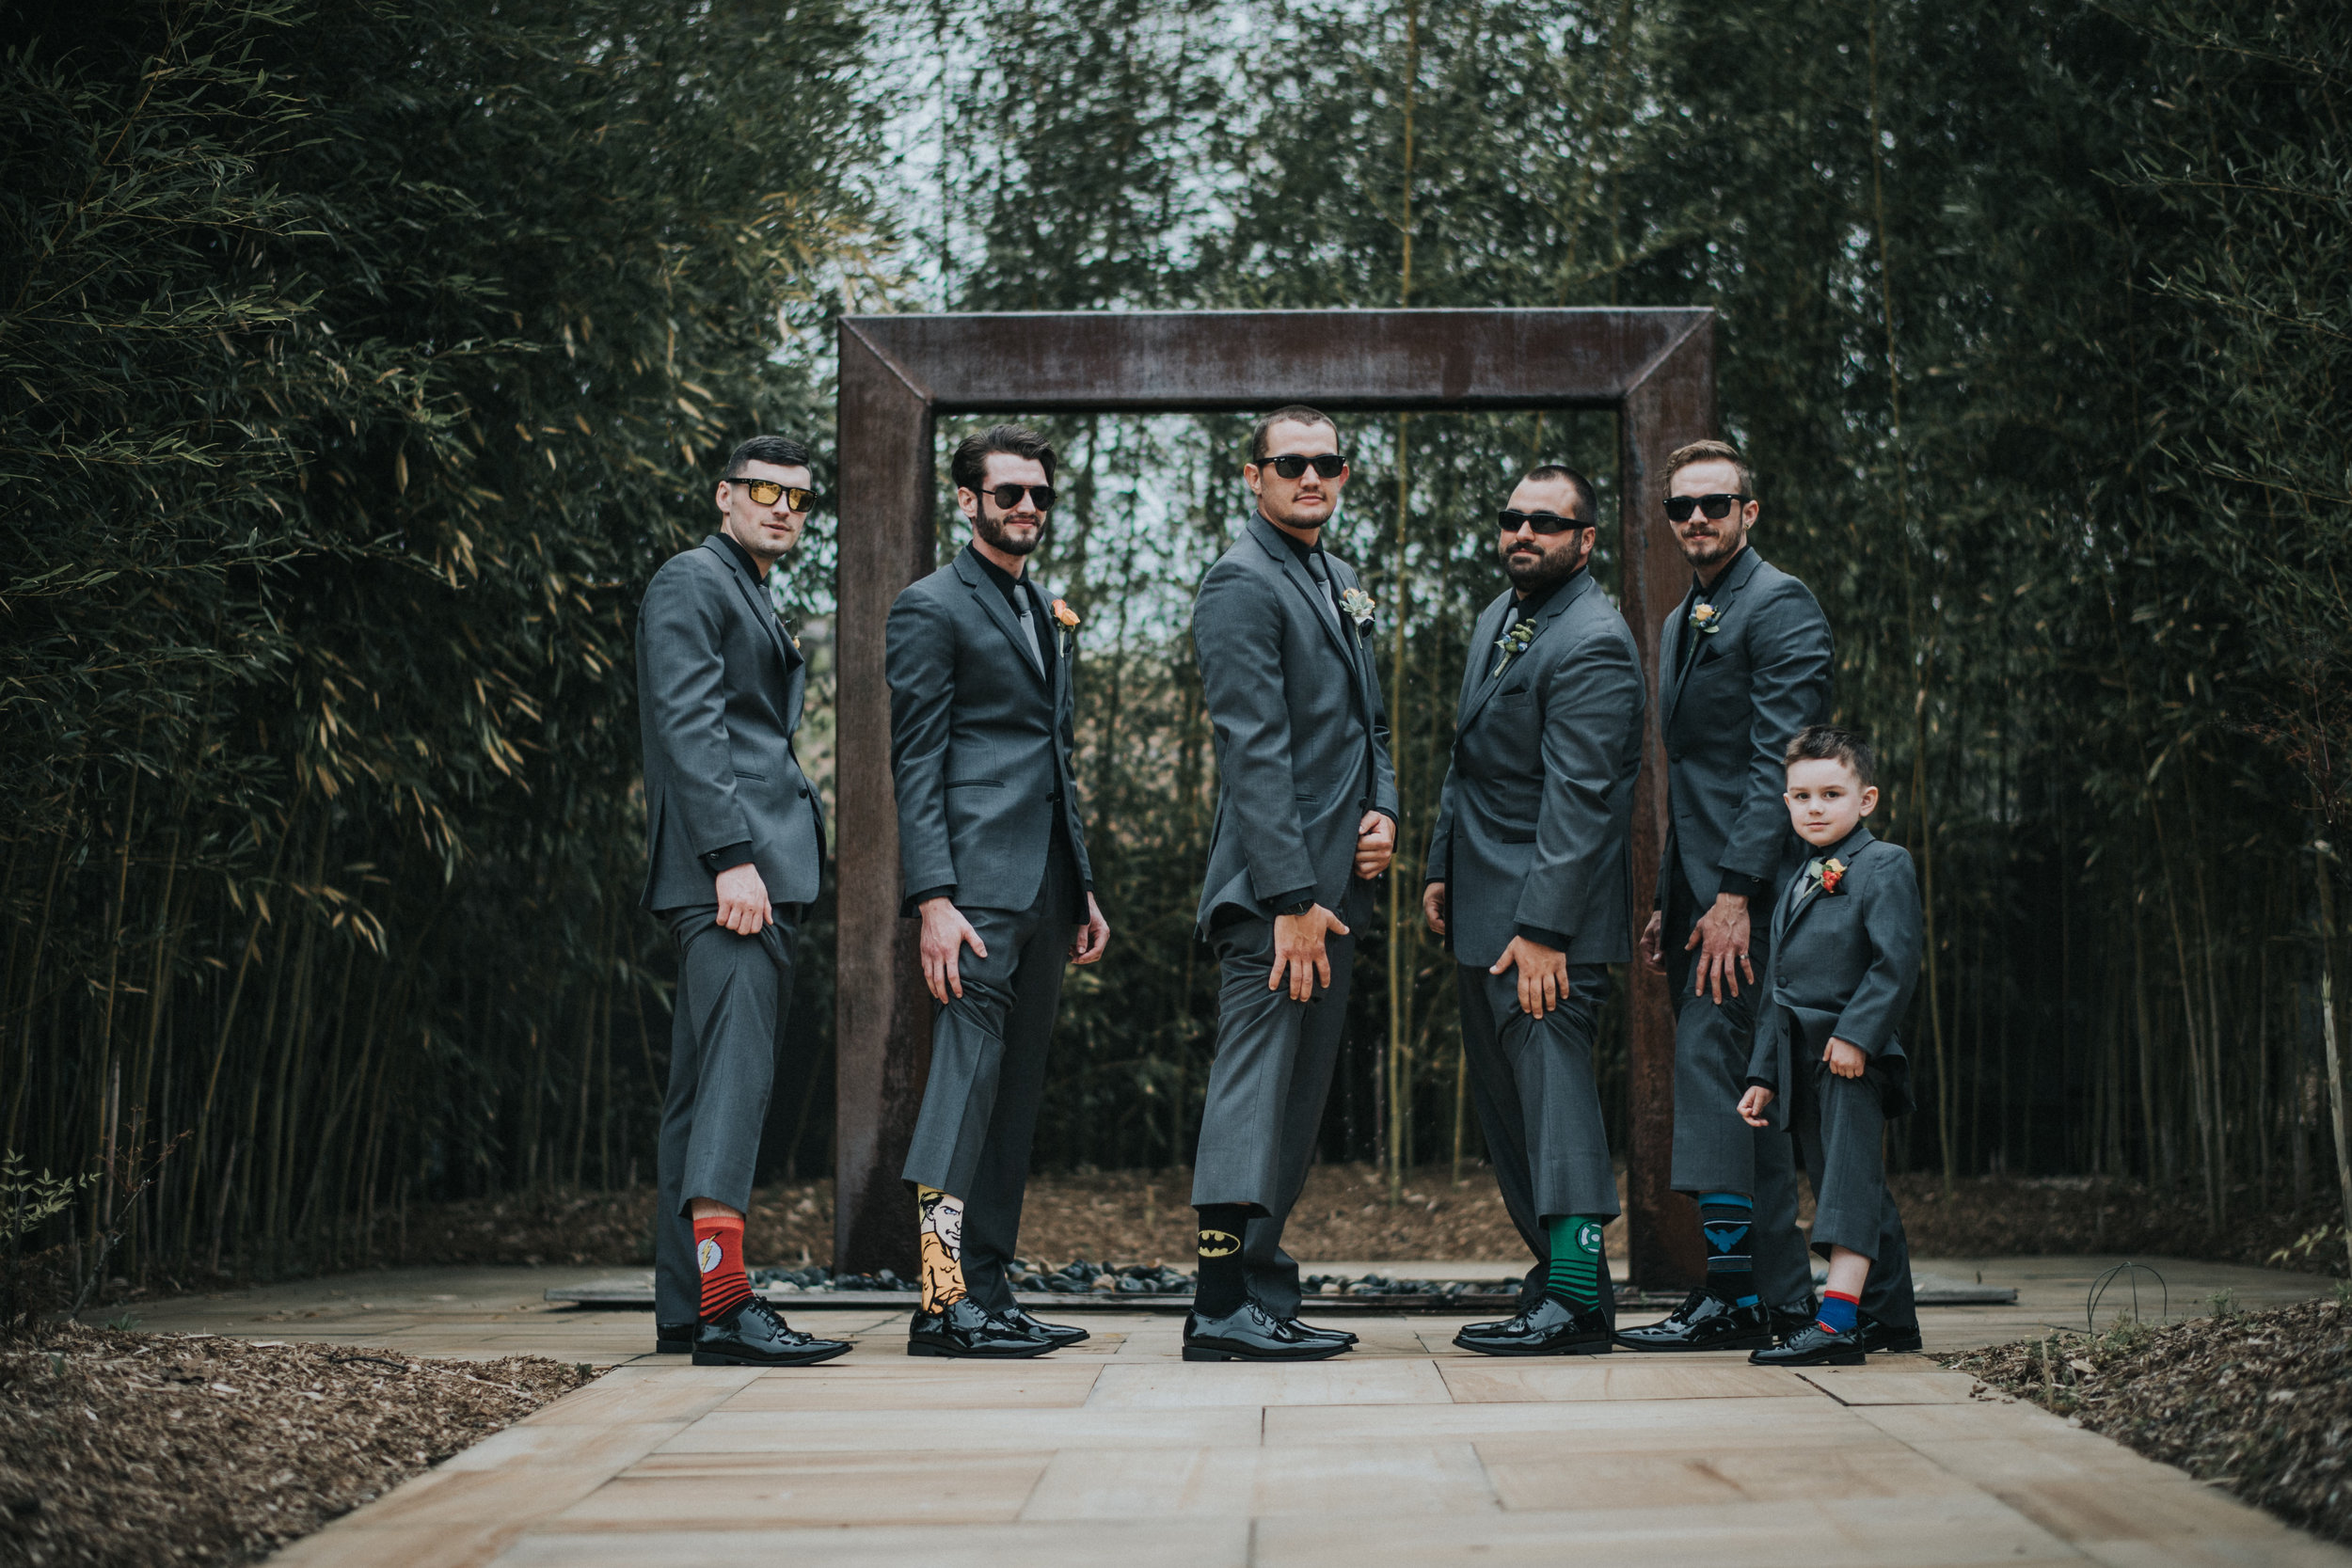 New-Jersey-Wedding-Photographer-Megan&Nick-BridalParty-37.jpg